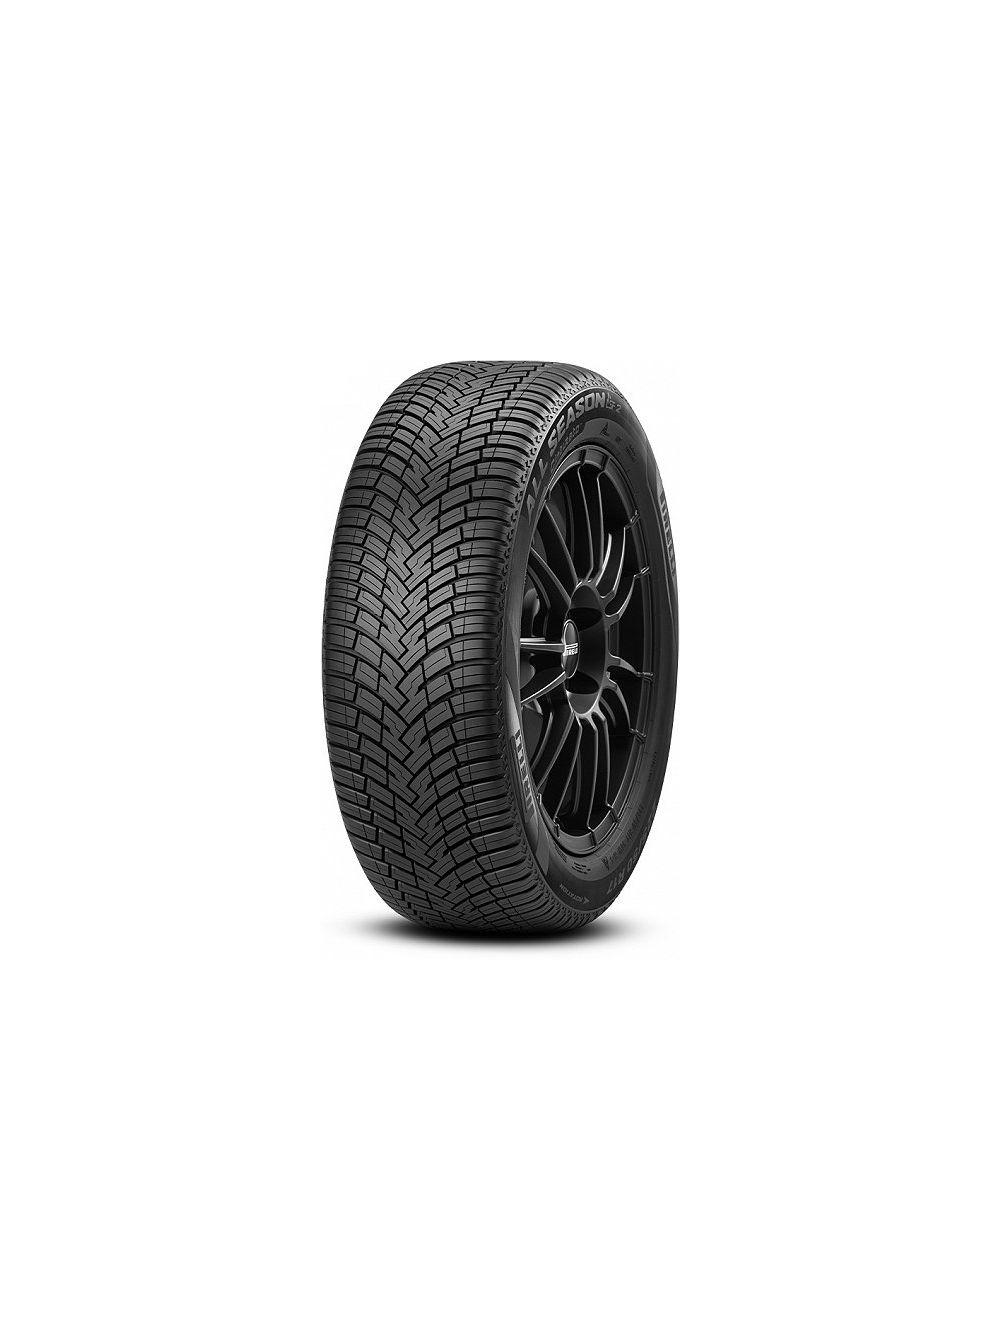 Pirelli 195/55R20 H Cinturato All Season SF2 XL Négyévszakos gumi